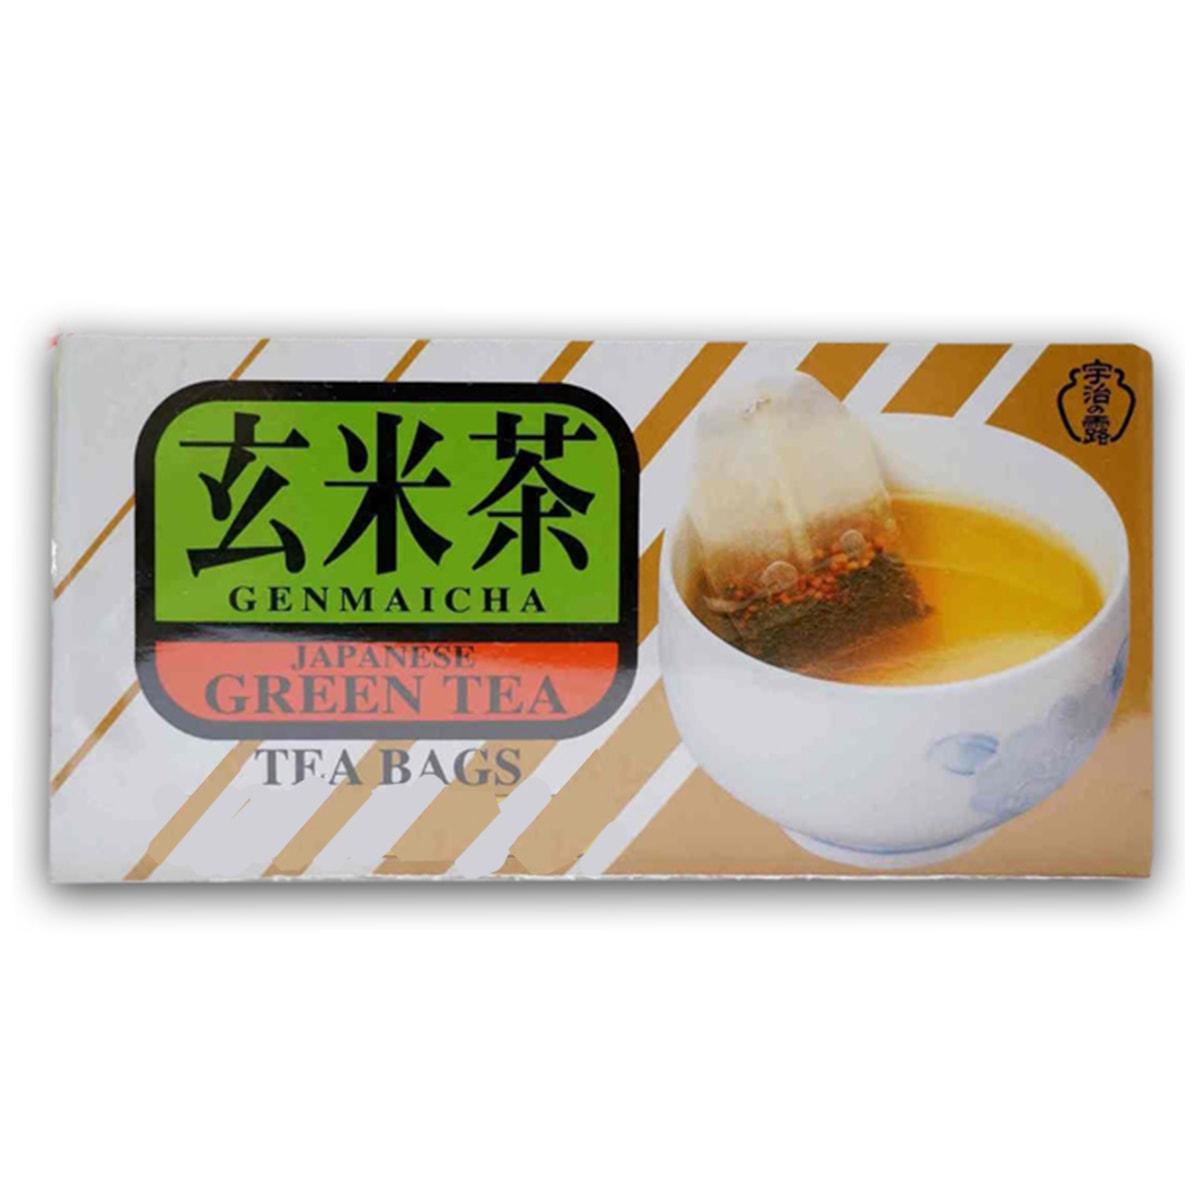 Buy Ujinotsuyu Japanese Green Tea with Roasted Rice (Genmaicha) (20 Teabags) - 40 gm